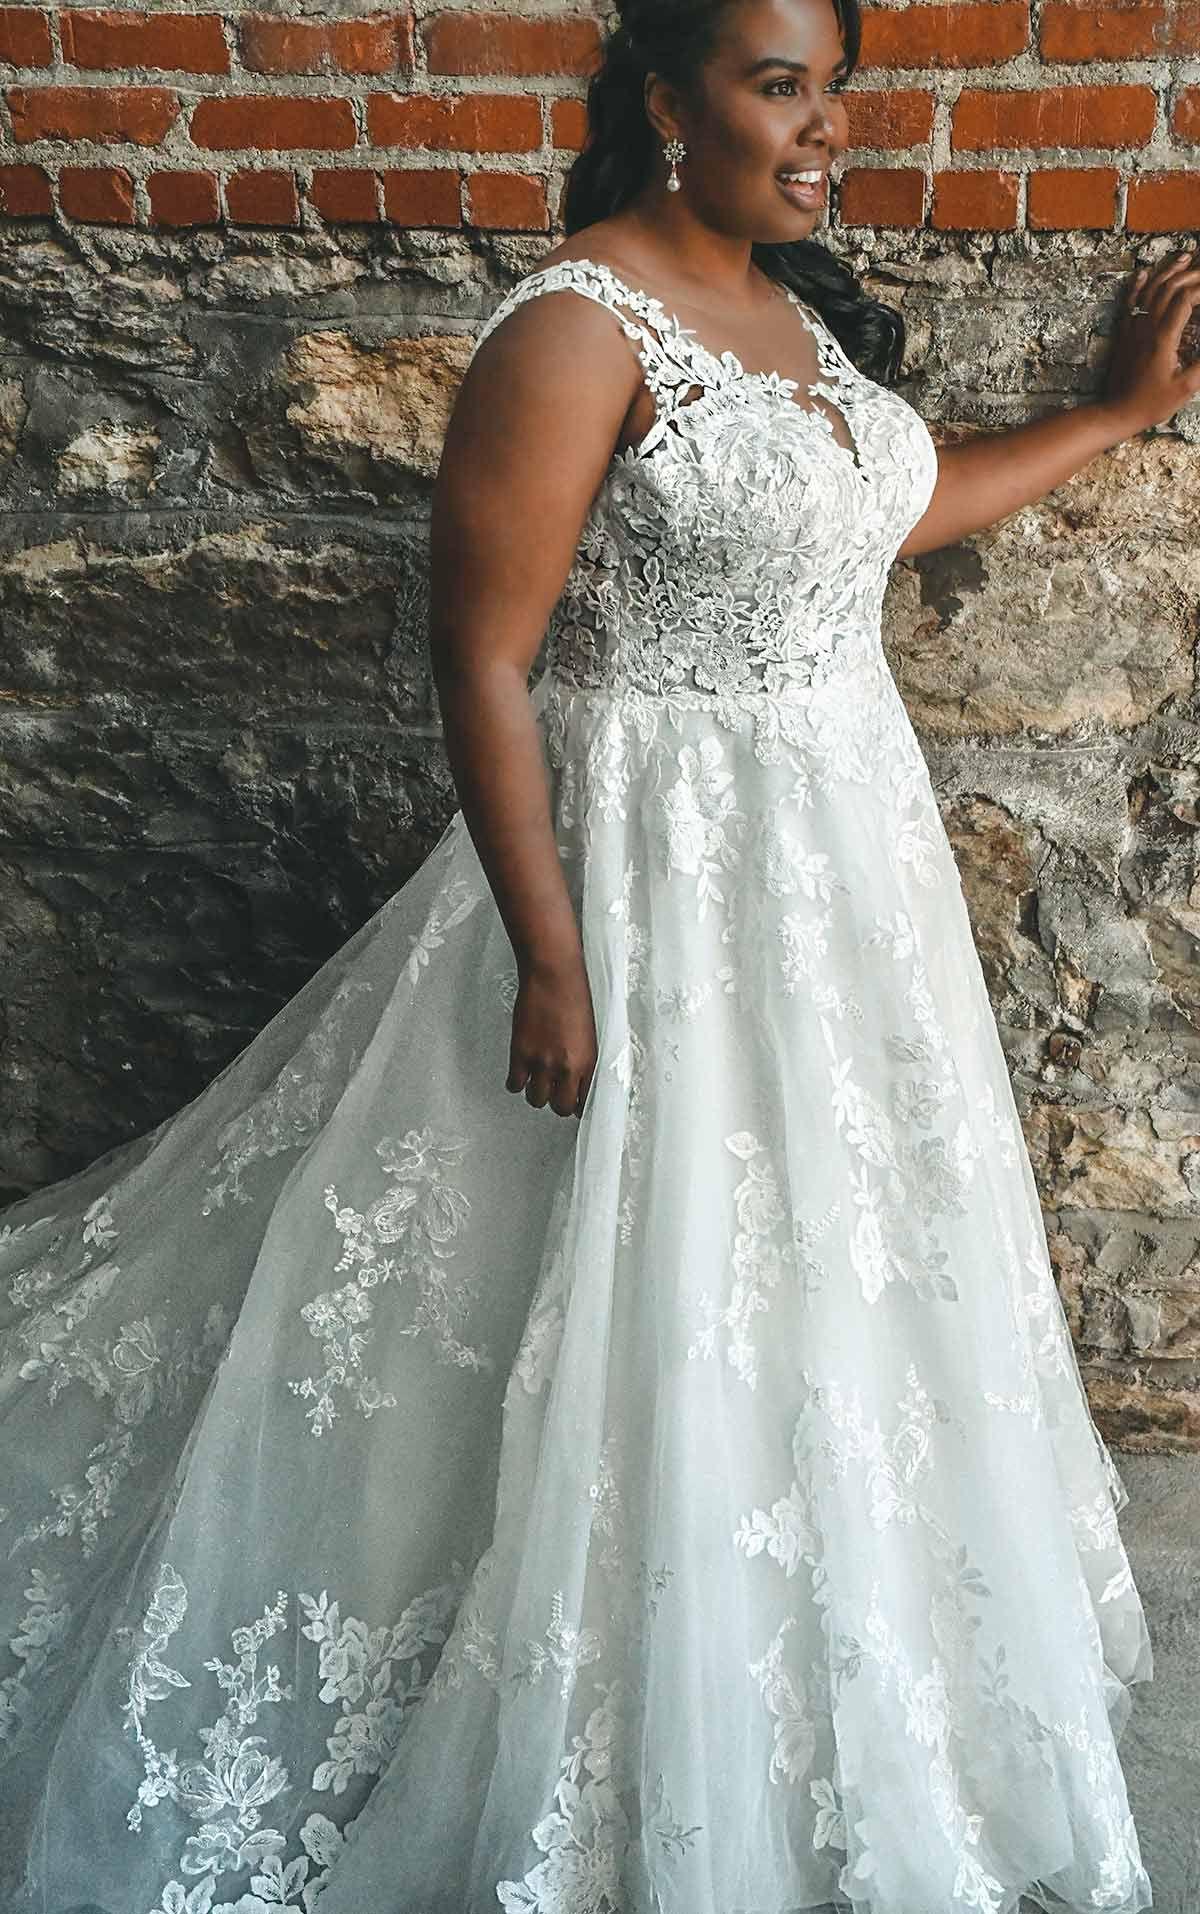 Wedding Dress Style D2805 Essense Of Australia Plus Size Wedding Dresses With Sleeves Plus Wedding Dresses Essense Of Australia Wedding Dresses [ 1914 x 1200 Pixel ]